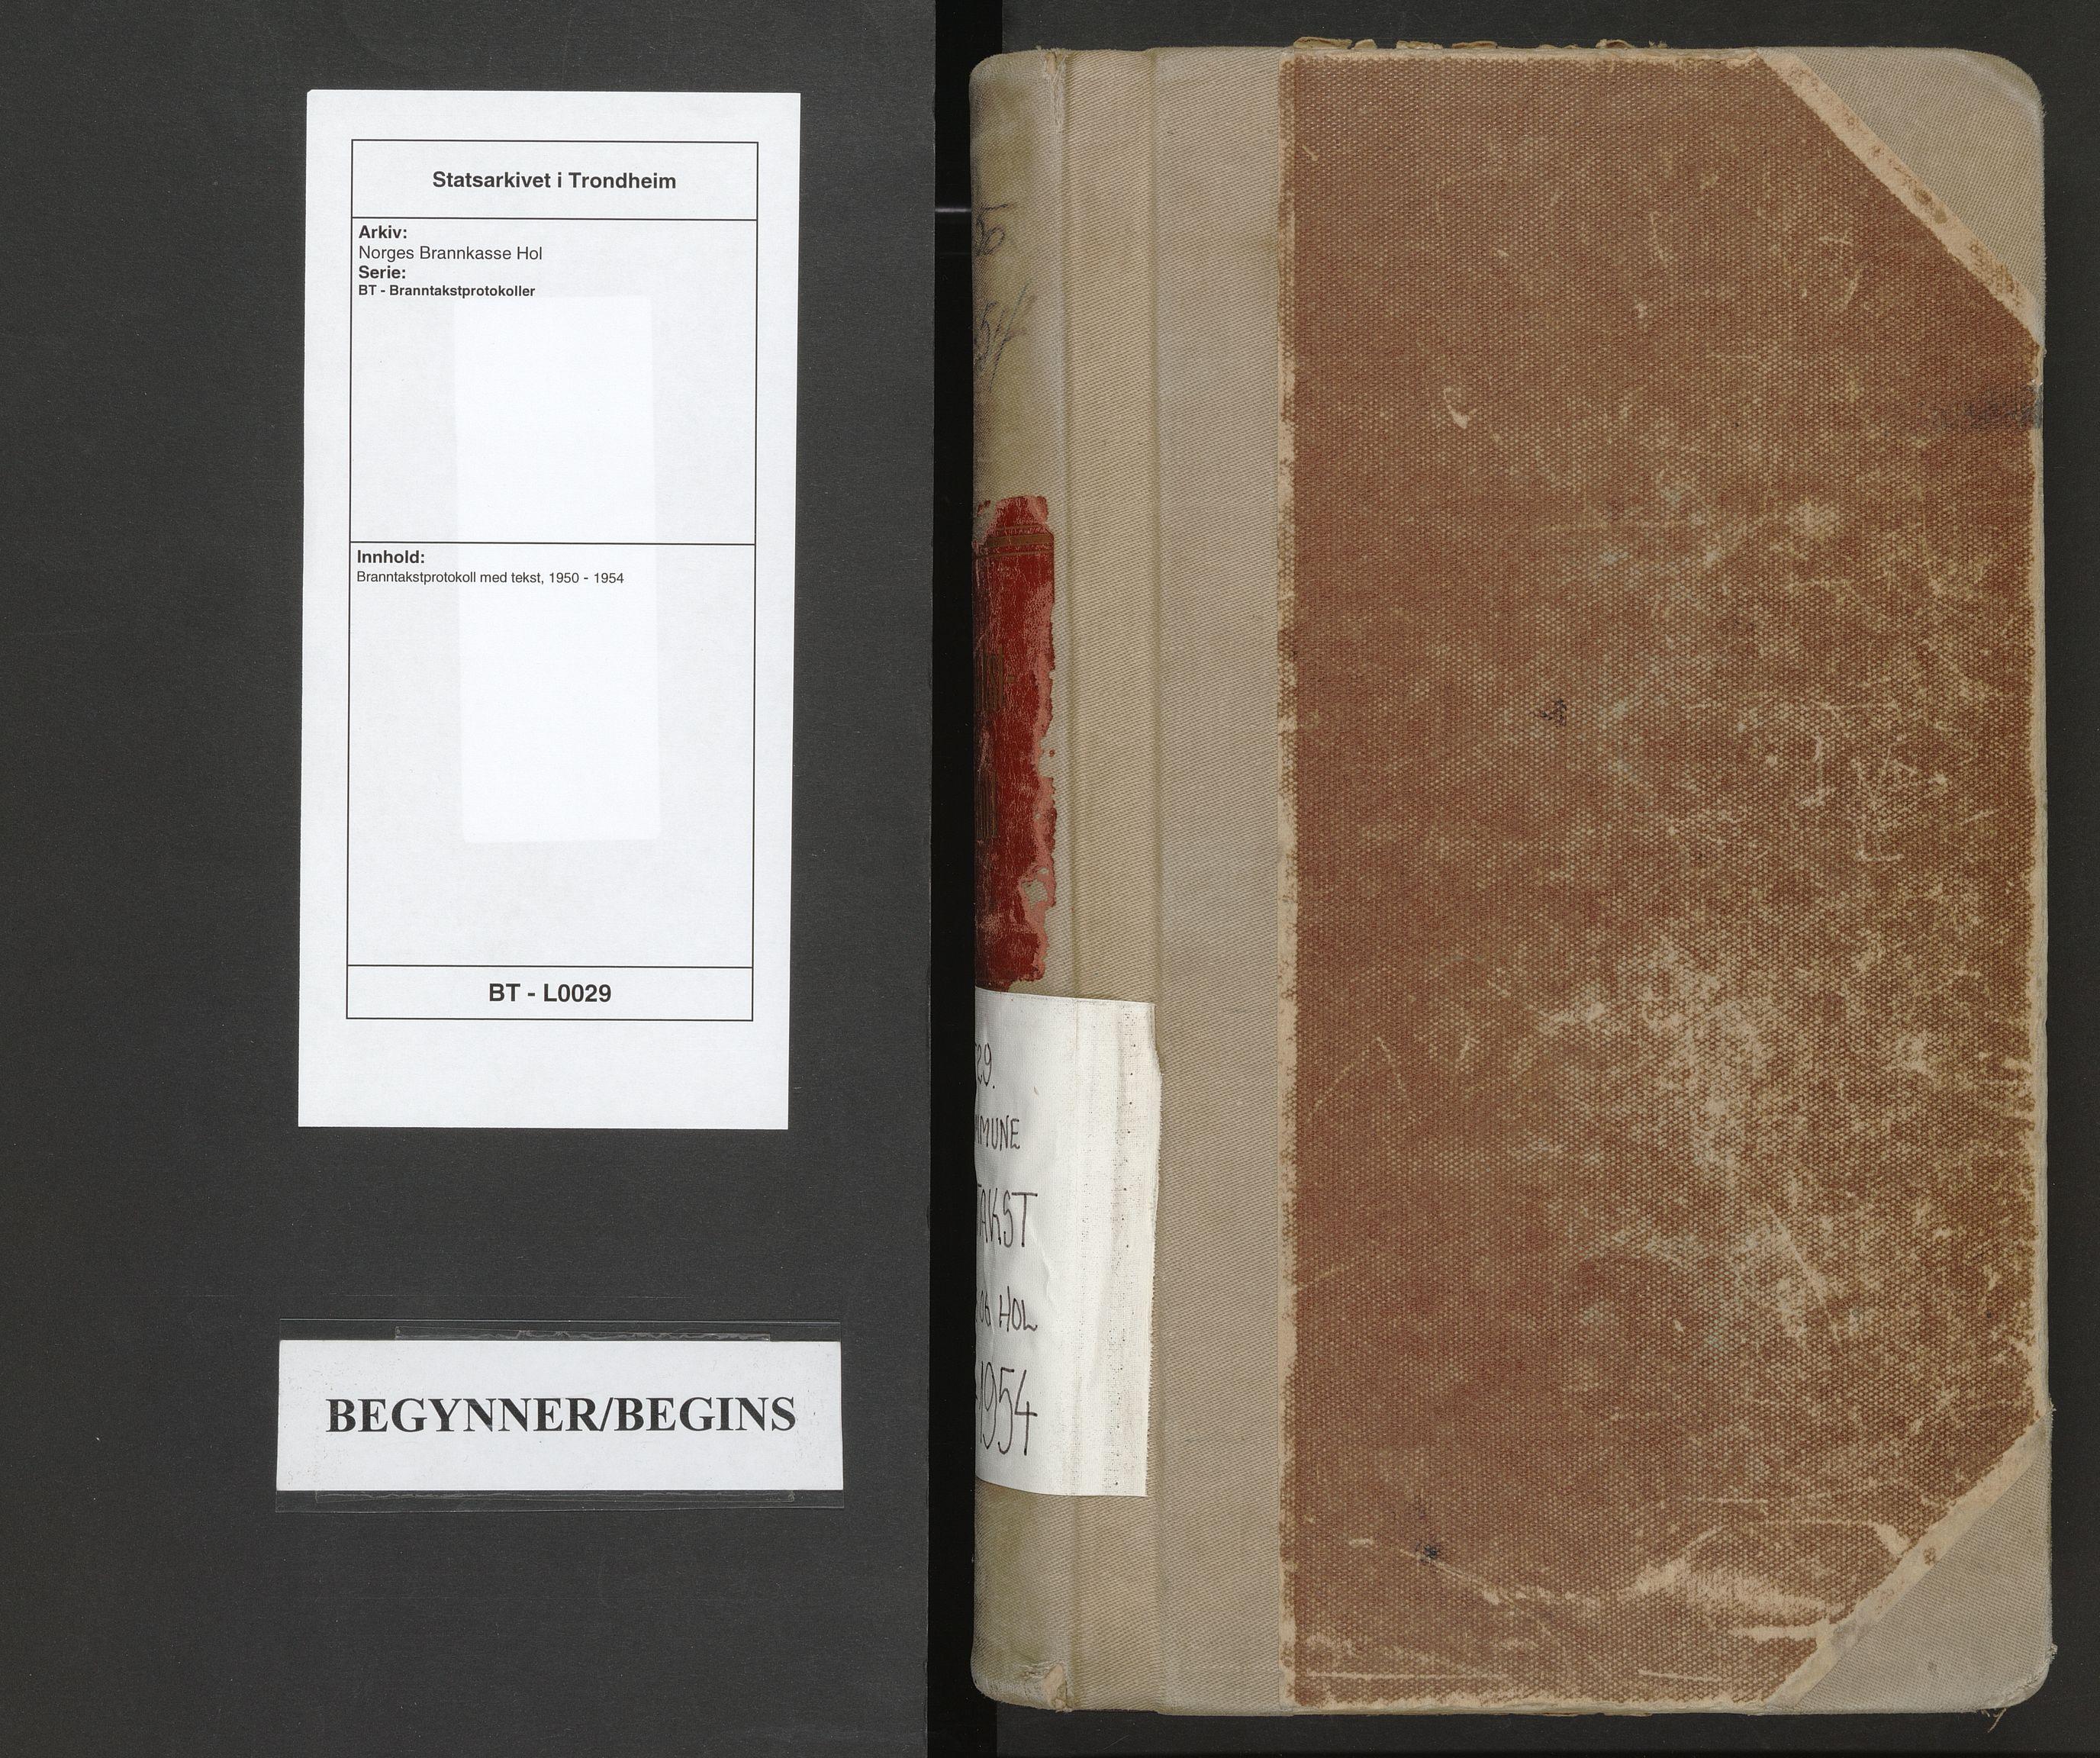 SAT, Norges Brannkasse Hol, BT/L0029: Branntakstprotokoll med tekst, 1950-1954